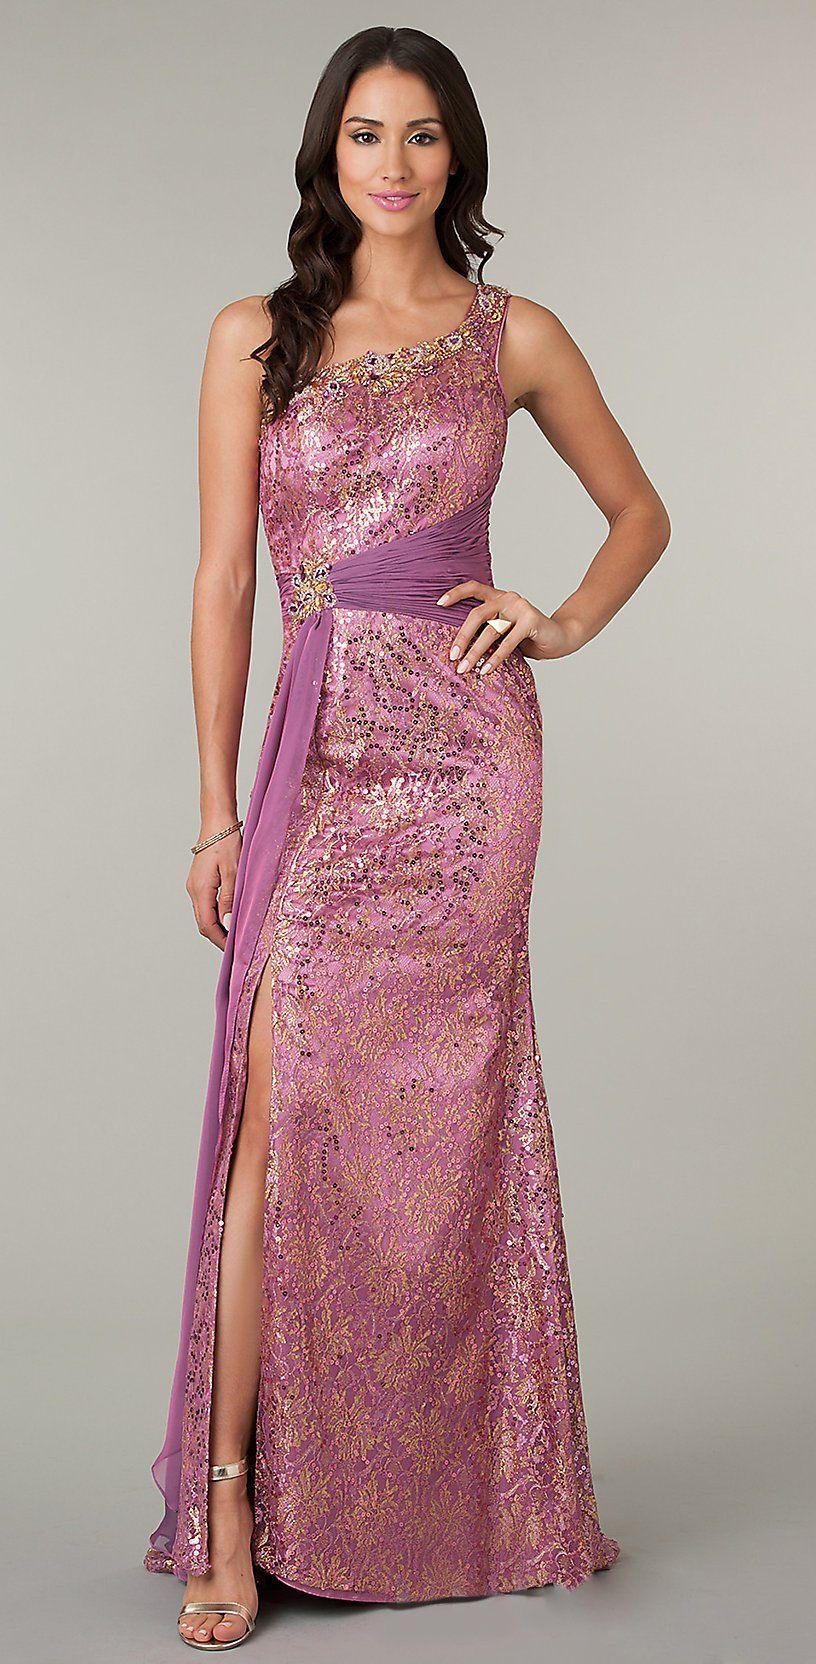 Long mermaid one shoulder dusty rose sequins prom dress front slit